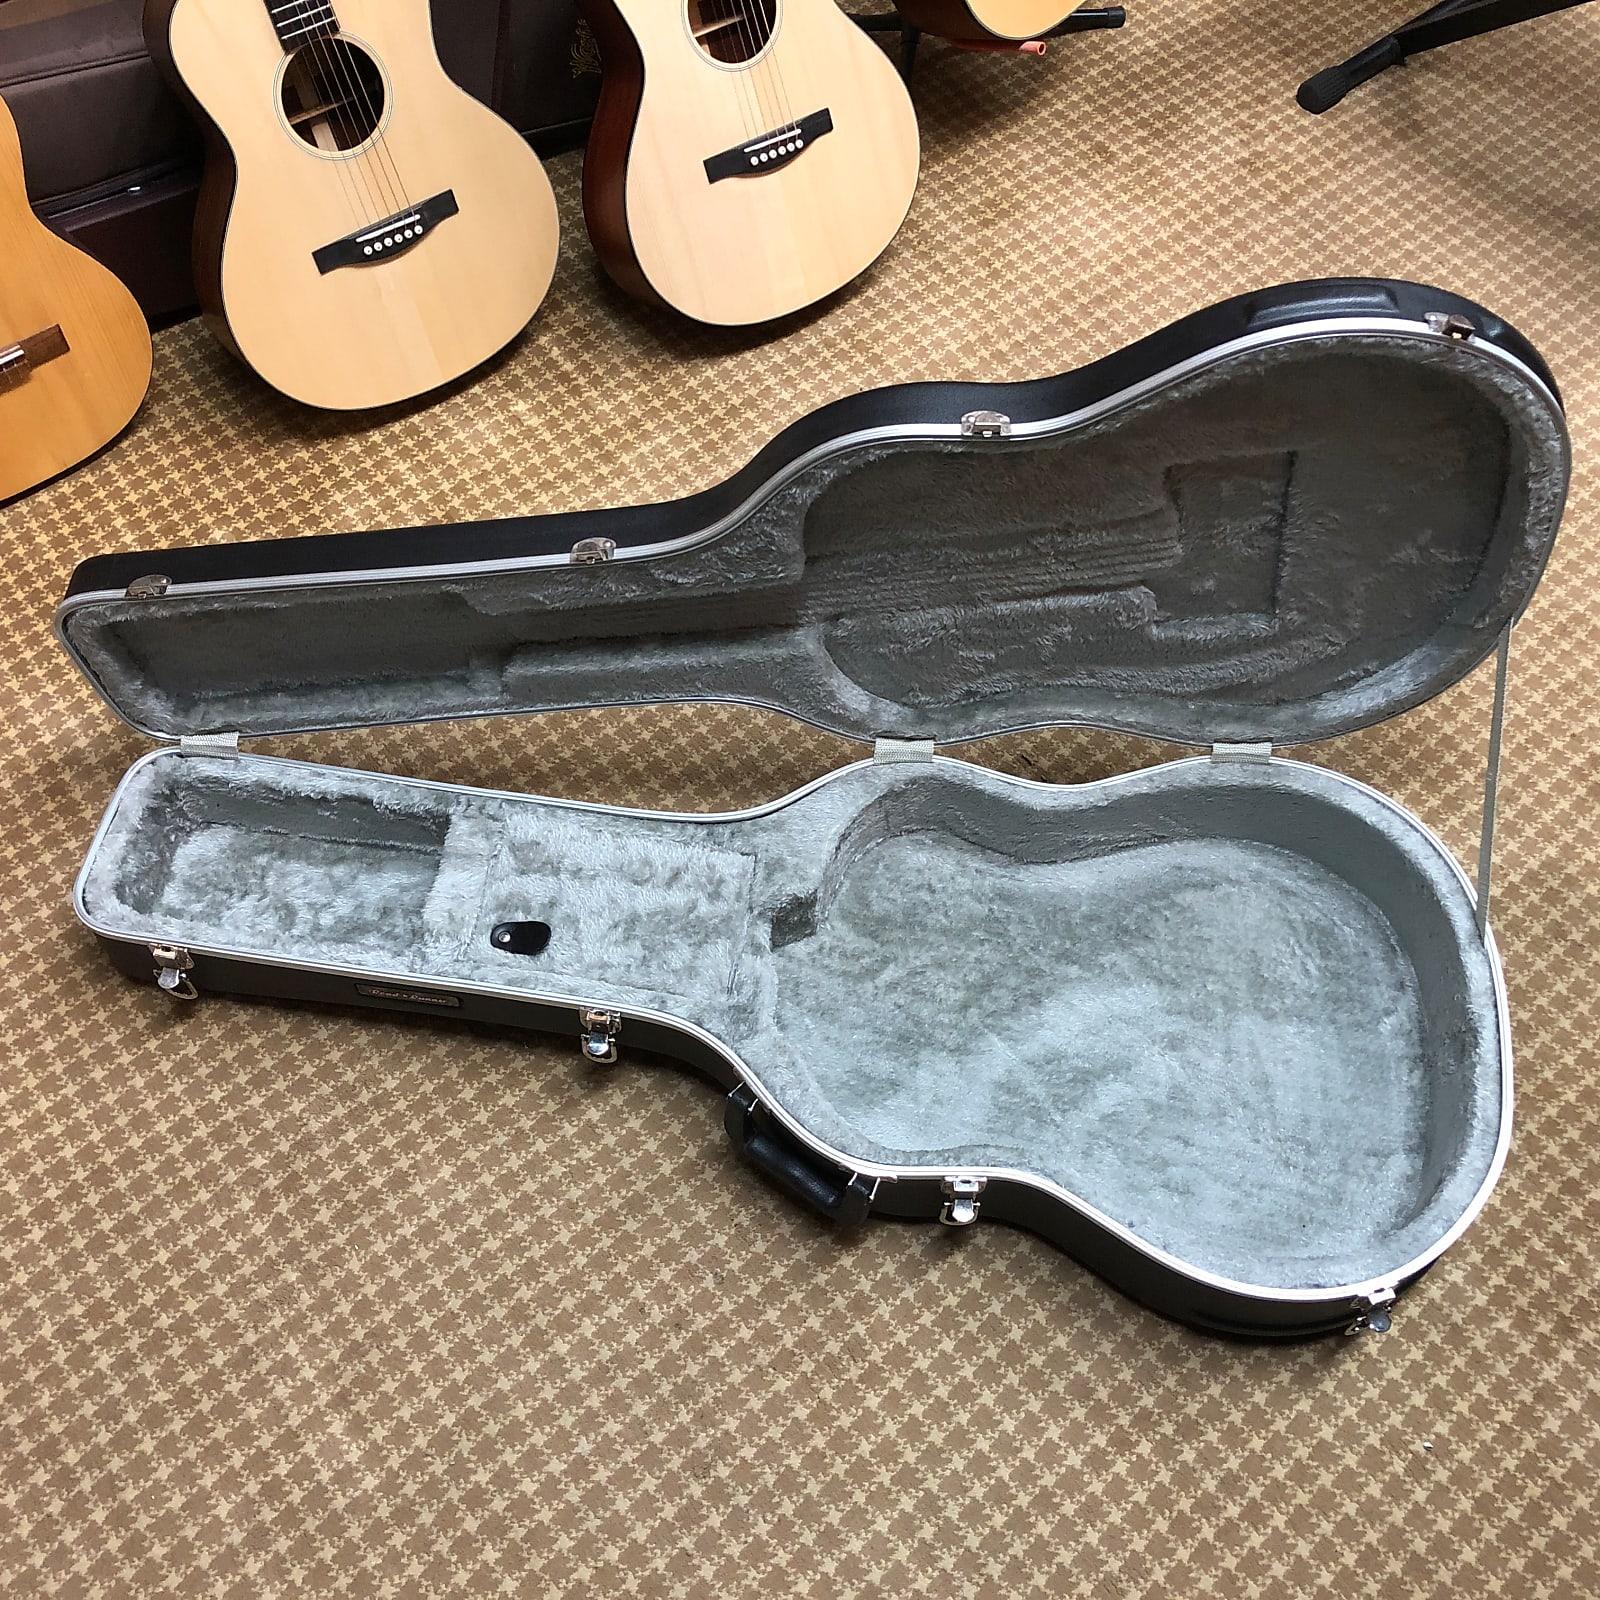 Road Runner RRMADN ABS Molded Dreadnought Acoustic Guitar Hardshell Case